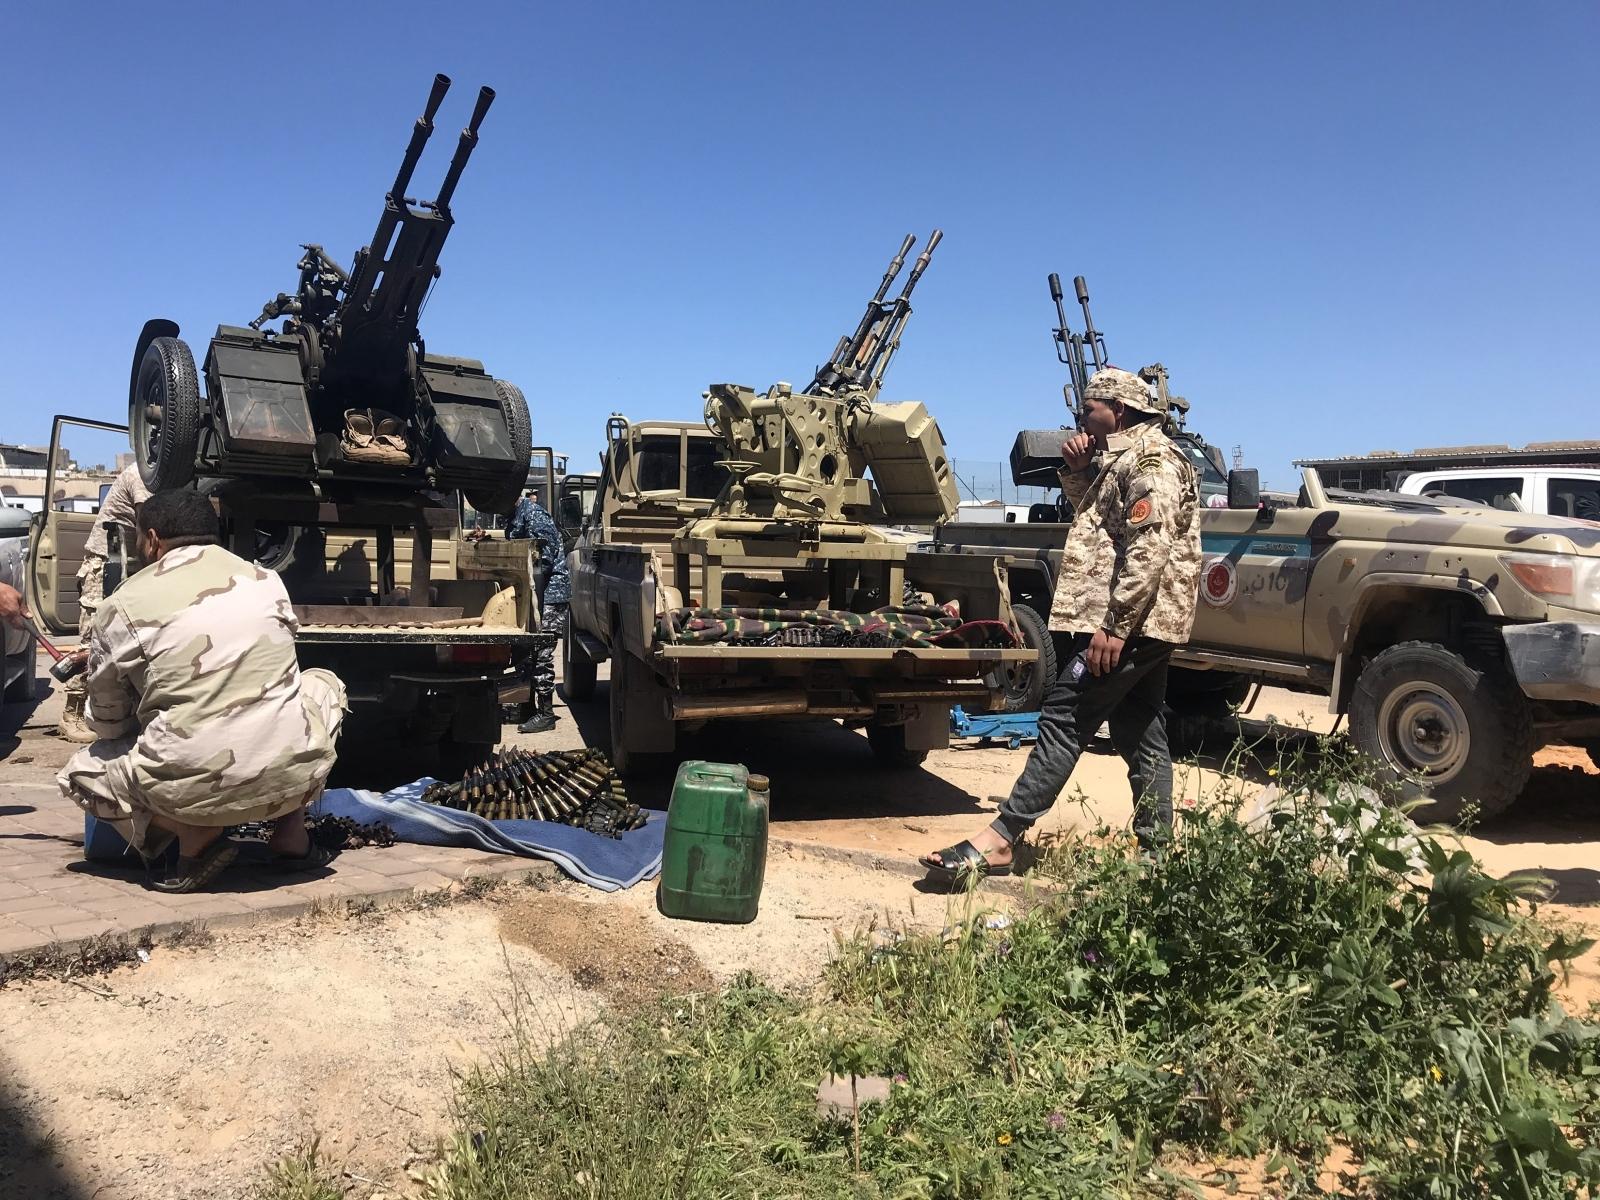 Libija, borec vladnih sil Vir:Pixsell